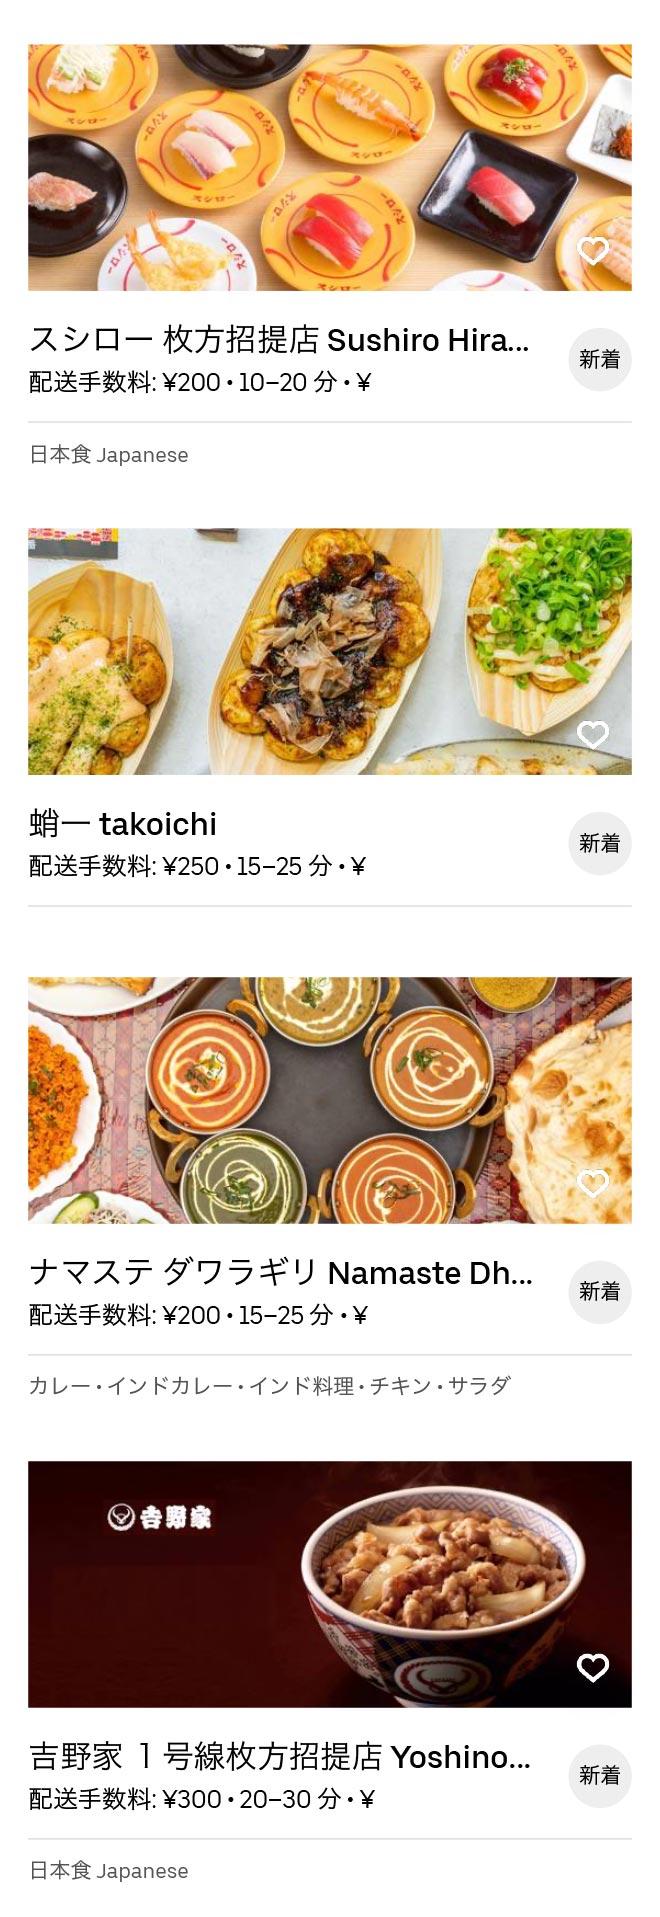 Hirakata kuzuha menu 2005 02